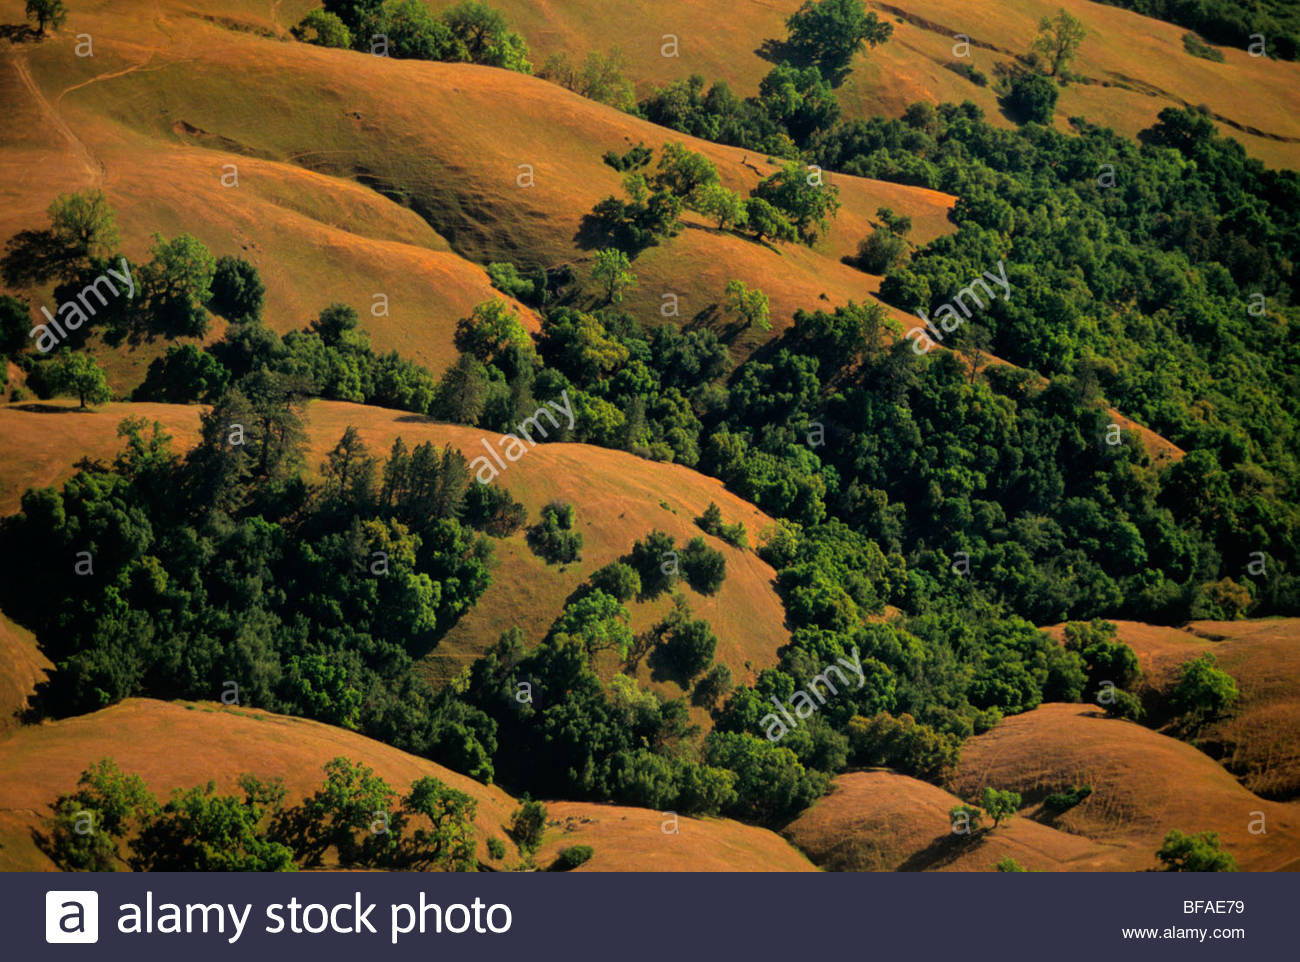 Oak woodland and hills (aerial), Big Sur, California - Stock Image